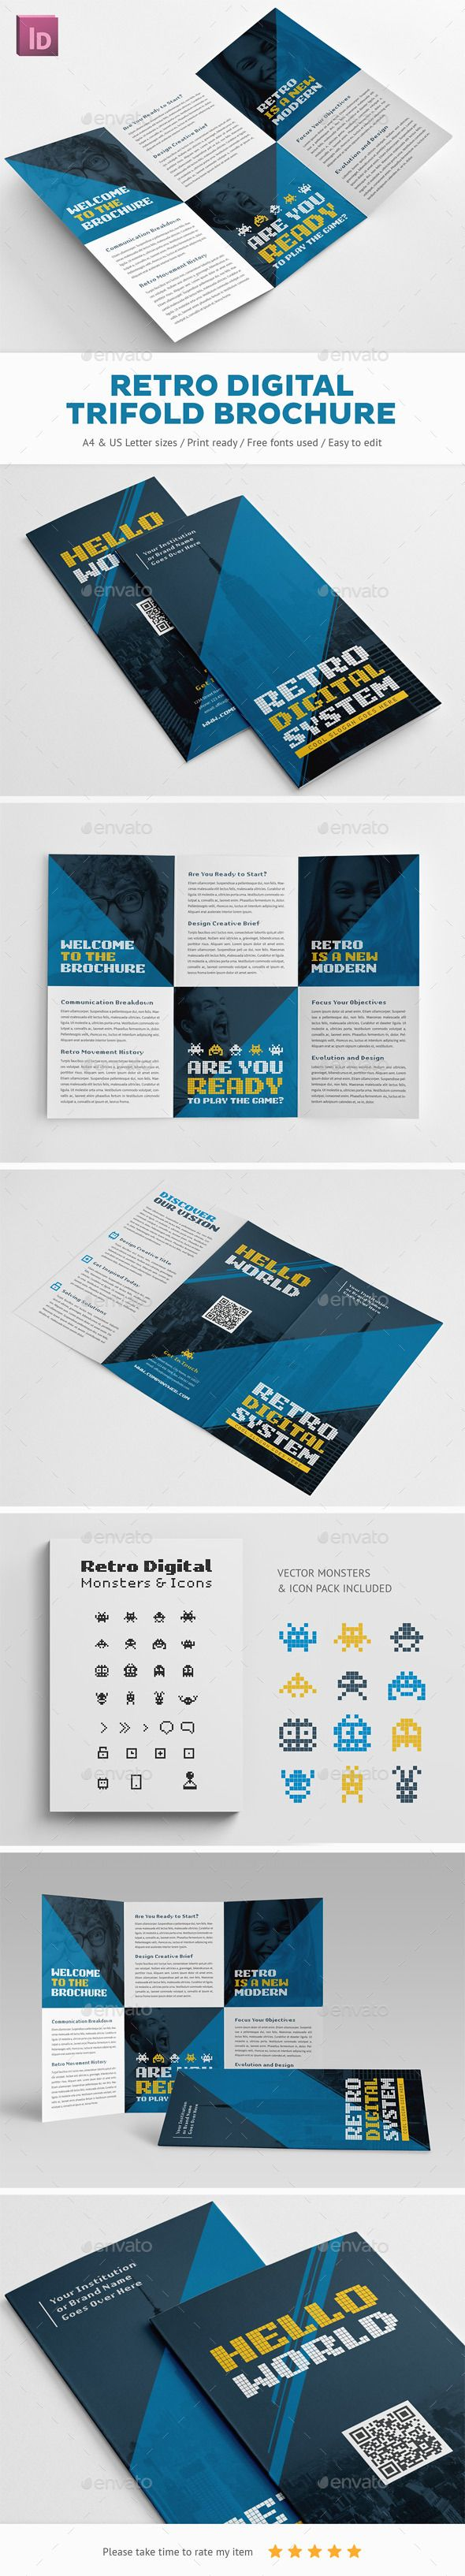 Retro Digital Trifold Brochure - Brochures Print Templates